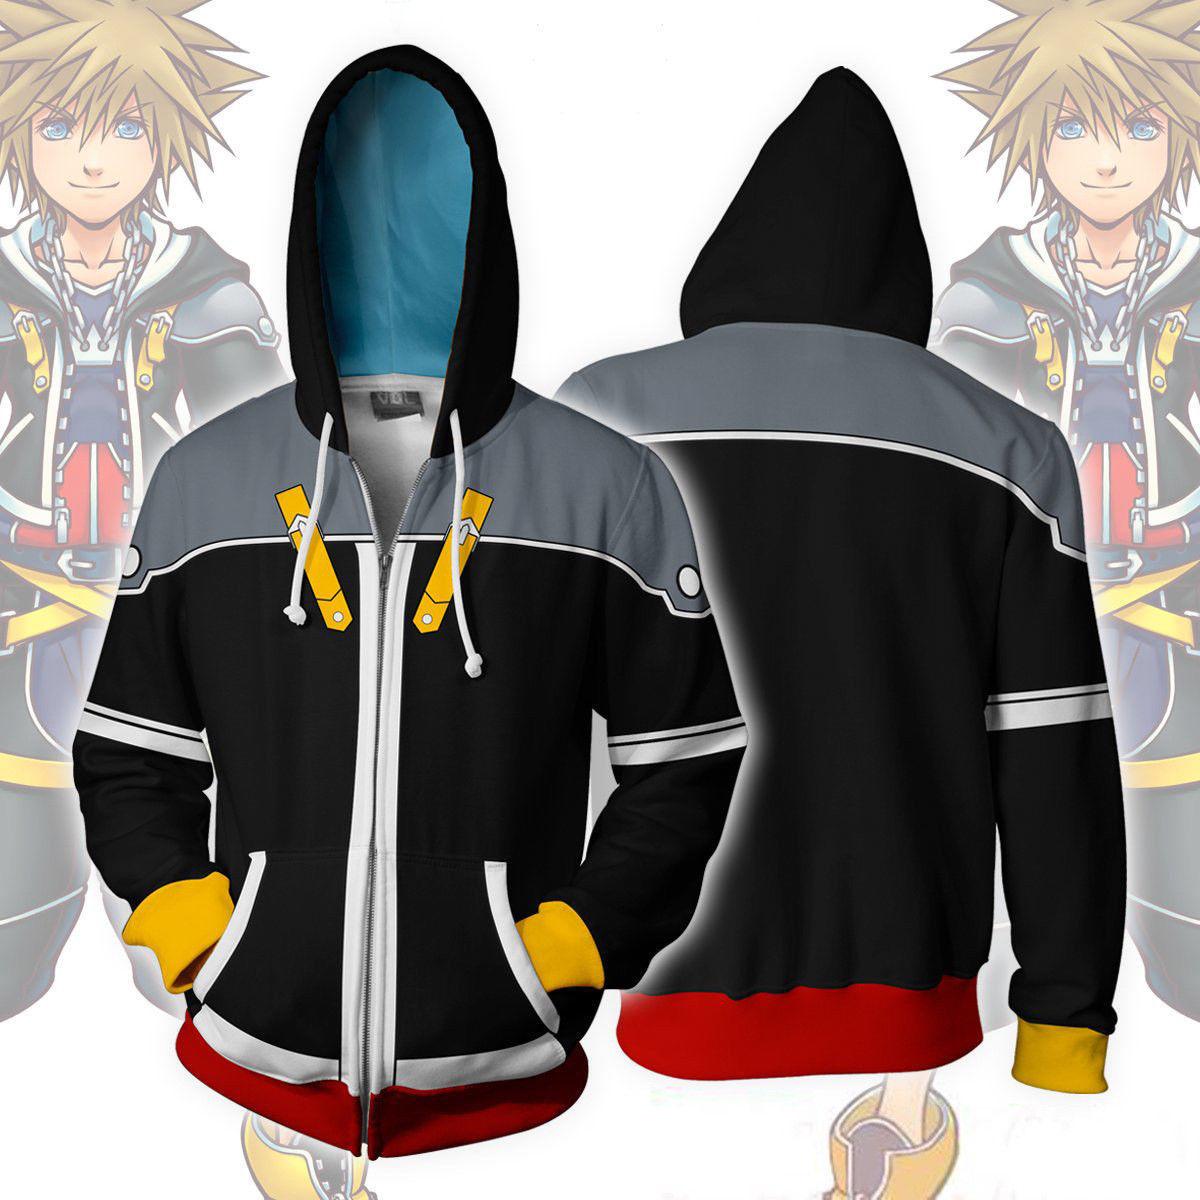 Anime Kingdom Hearts 2 Sora 3D Zipper Hoodie Jacket Coat Uniform Cosplay Costume Sweatshirt Outfit Cardigan Hooded plus size New